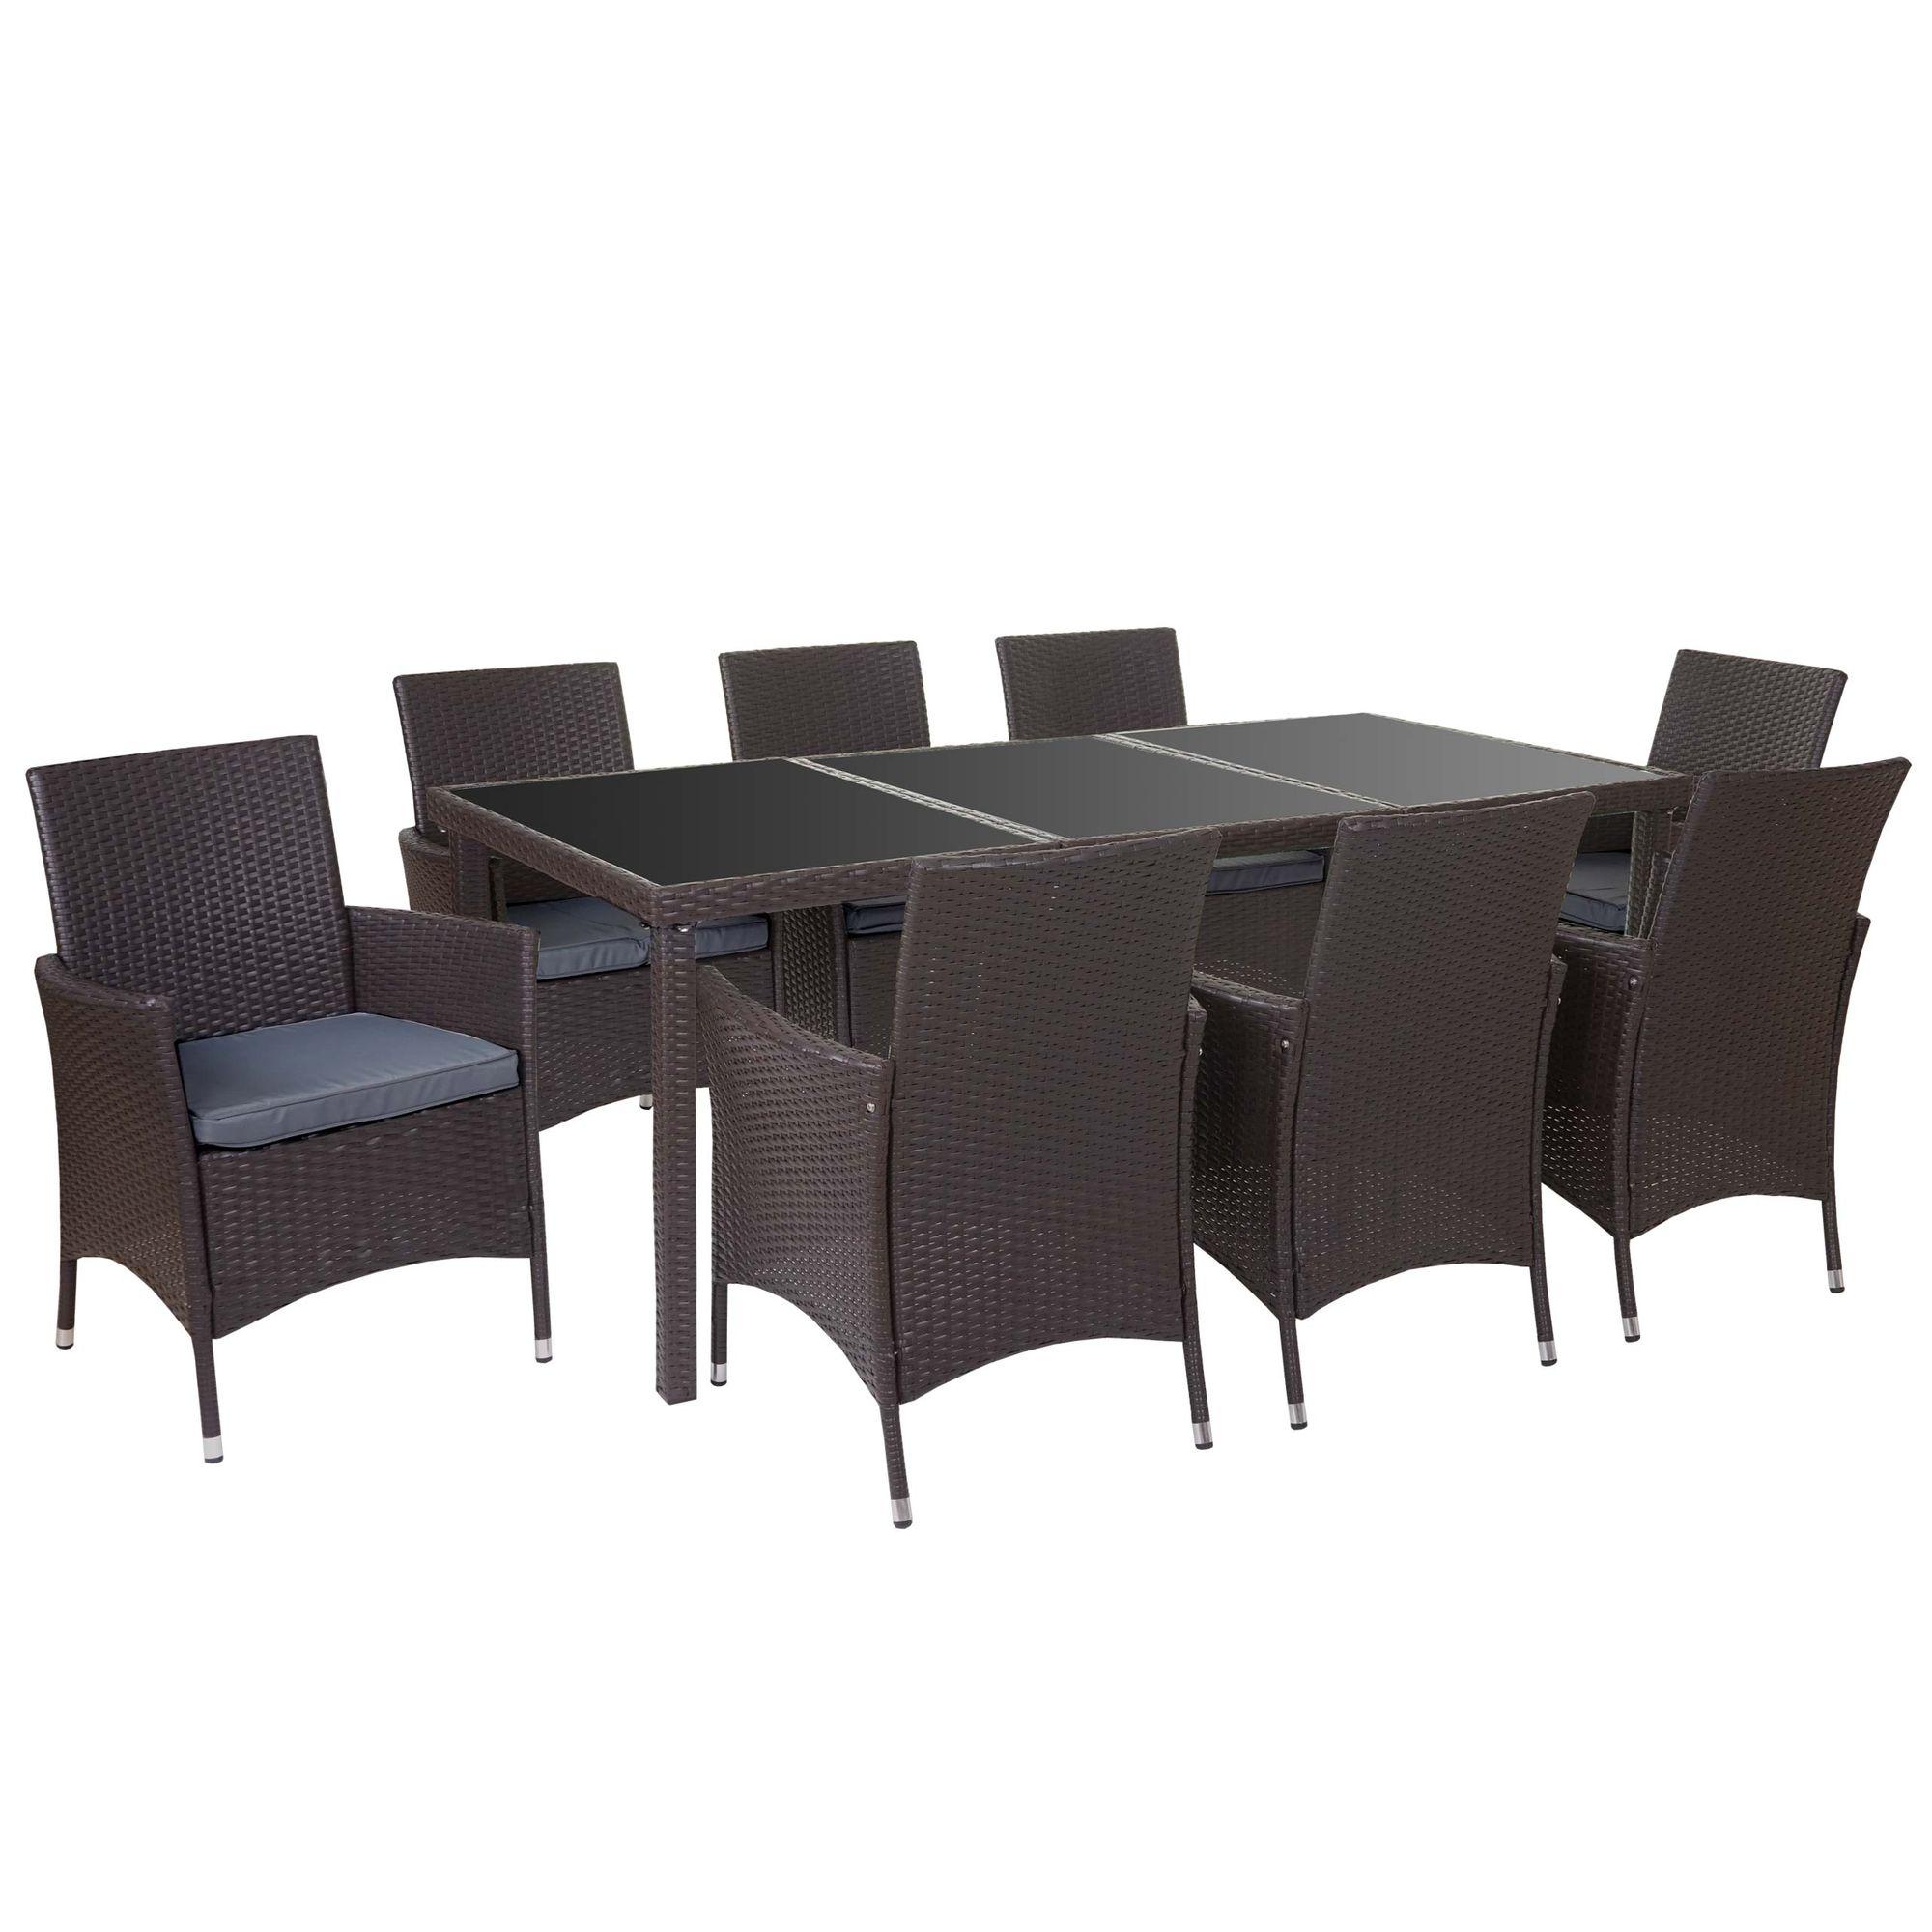 Poly-Rattan-Garnitur, Garten Sitzgruppe Tisch + 8 Sessel, Alu braun ...